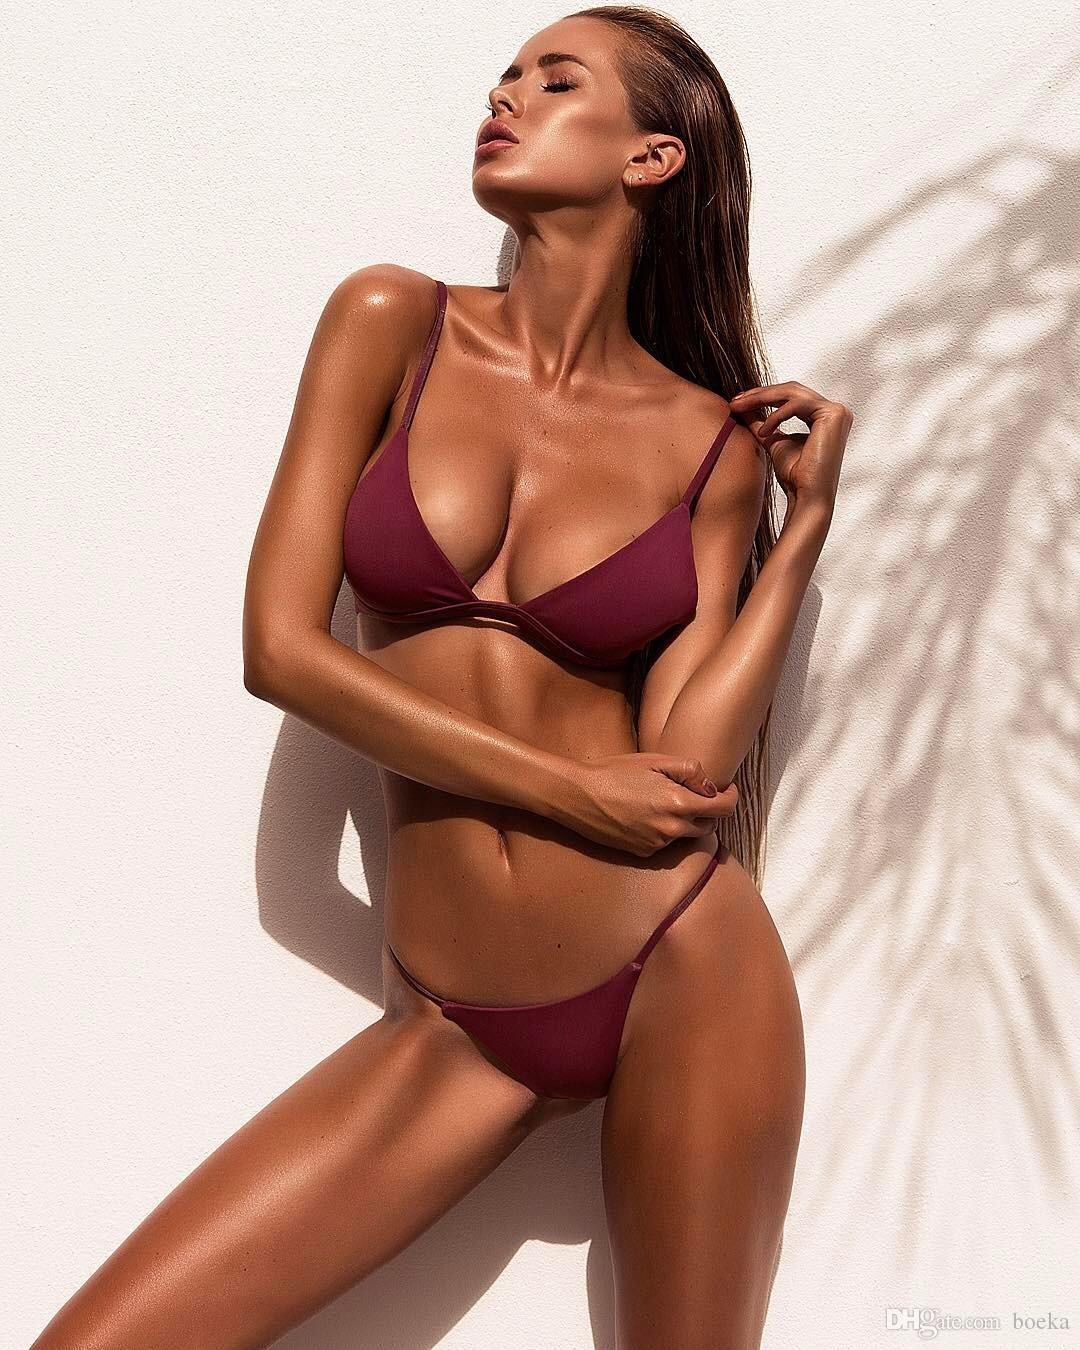 Mujeres Sexy De Top Micro Monokini Bikinis Maillot Brasileños Bain Tanga Traje Playa Solid Bikini 2018 Baño Set X8nwO0PNk